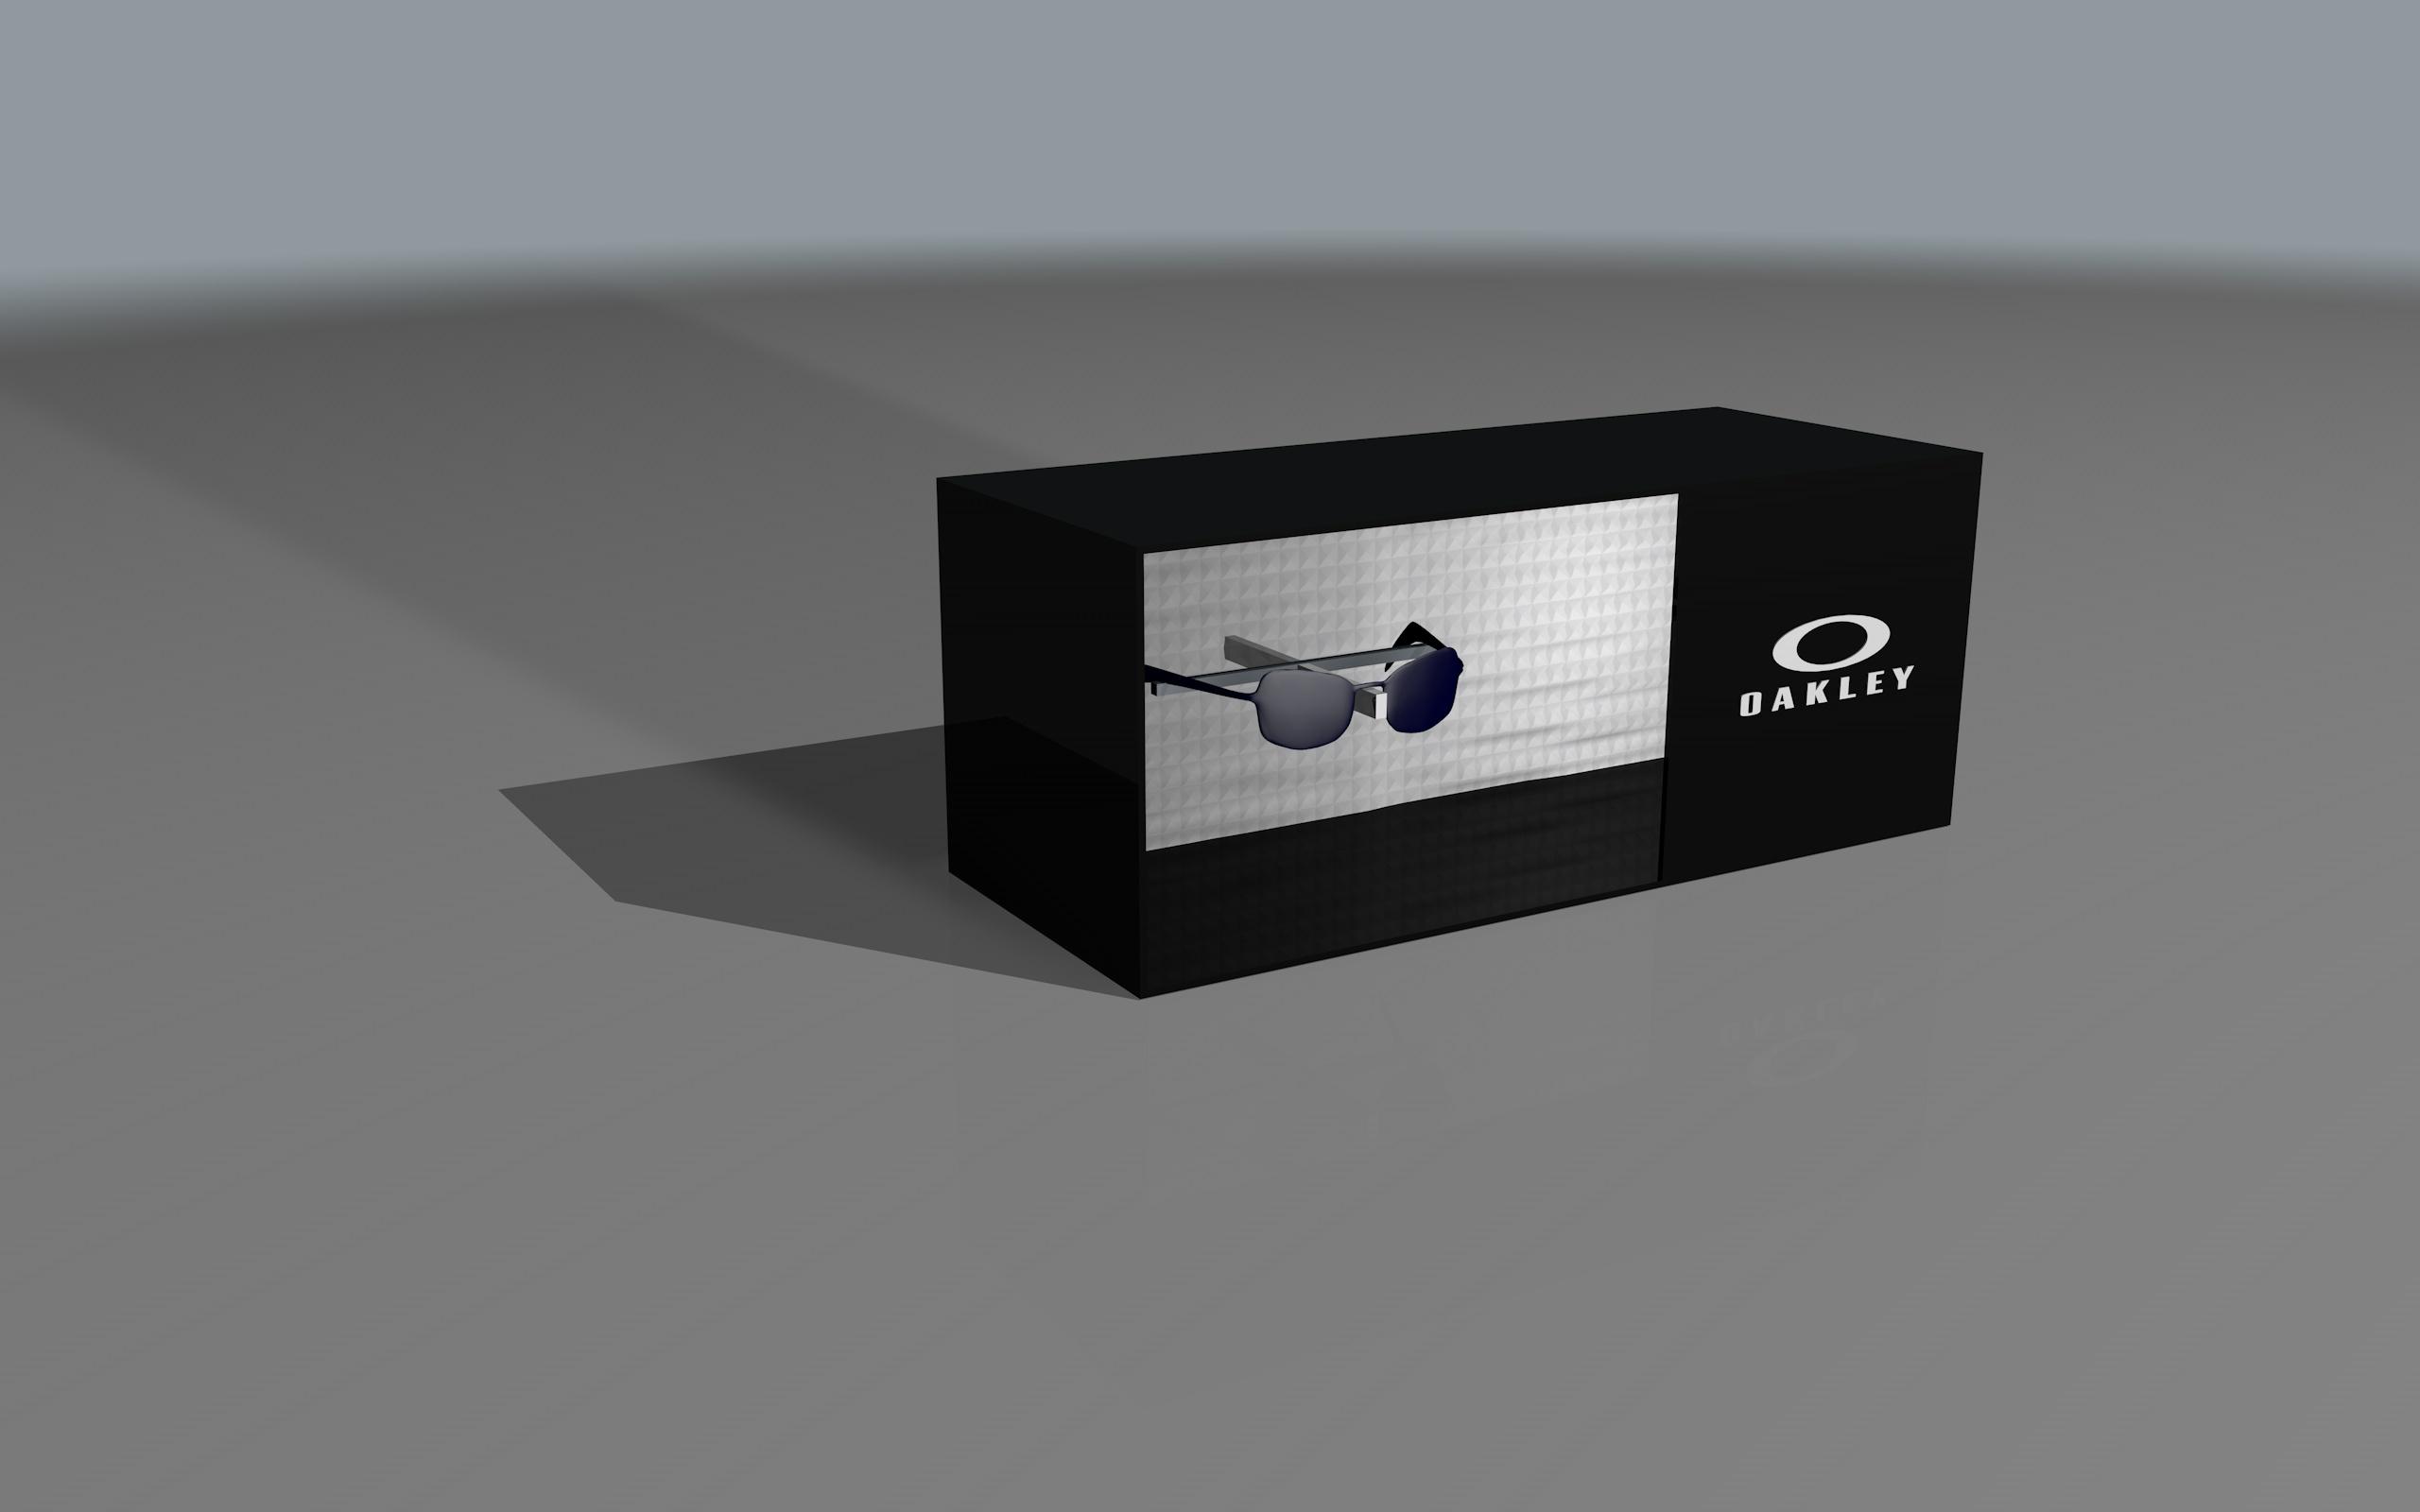 Expositor iluminado Oakley